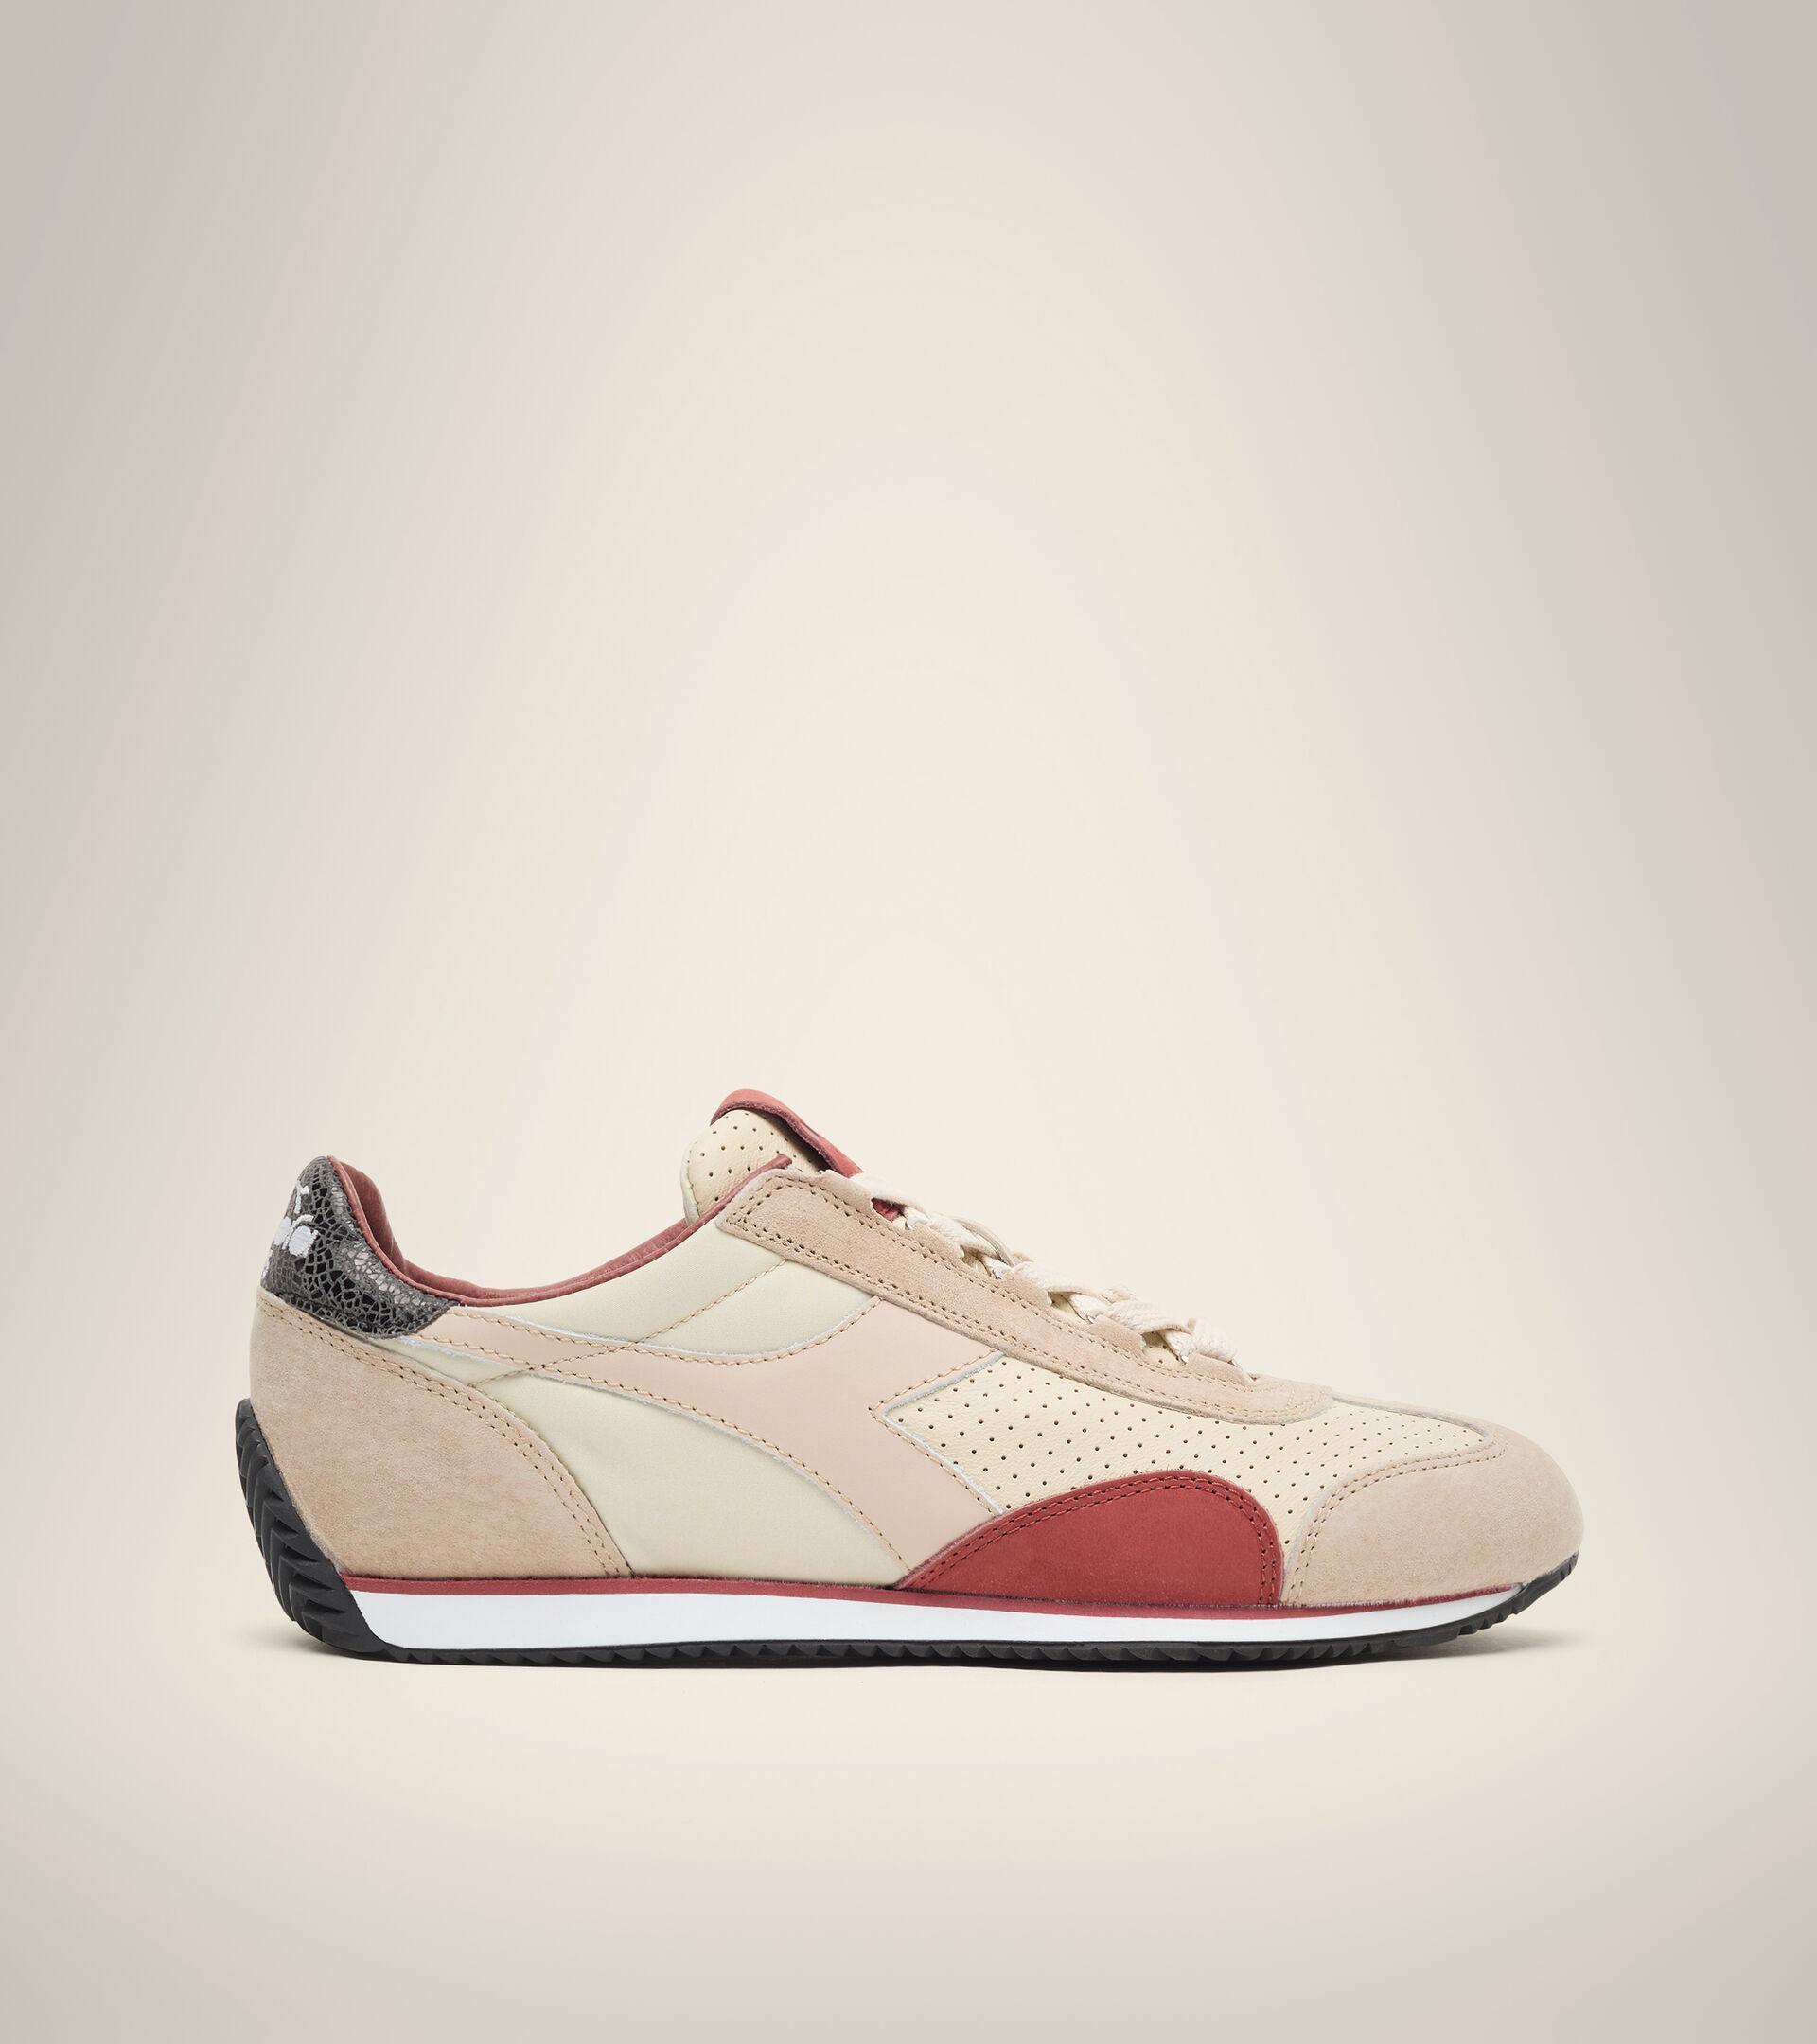 Footwear Heritage UOMO EQUIPE ITALIA BLANCA OSTRA Diadora